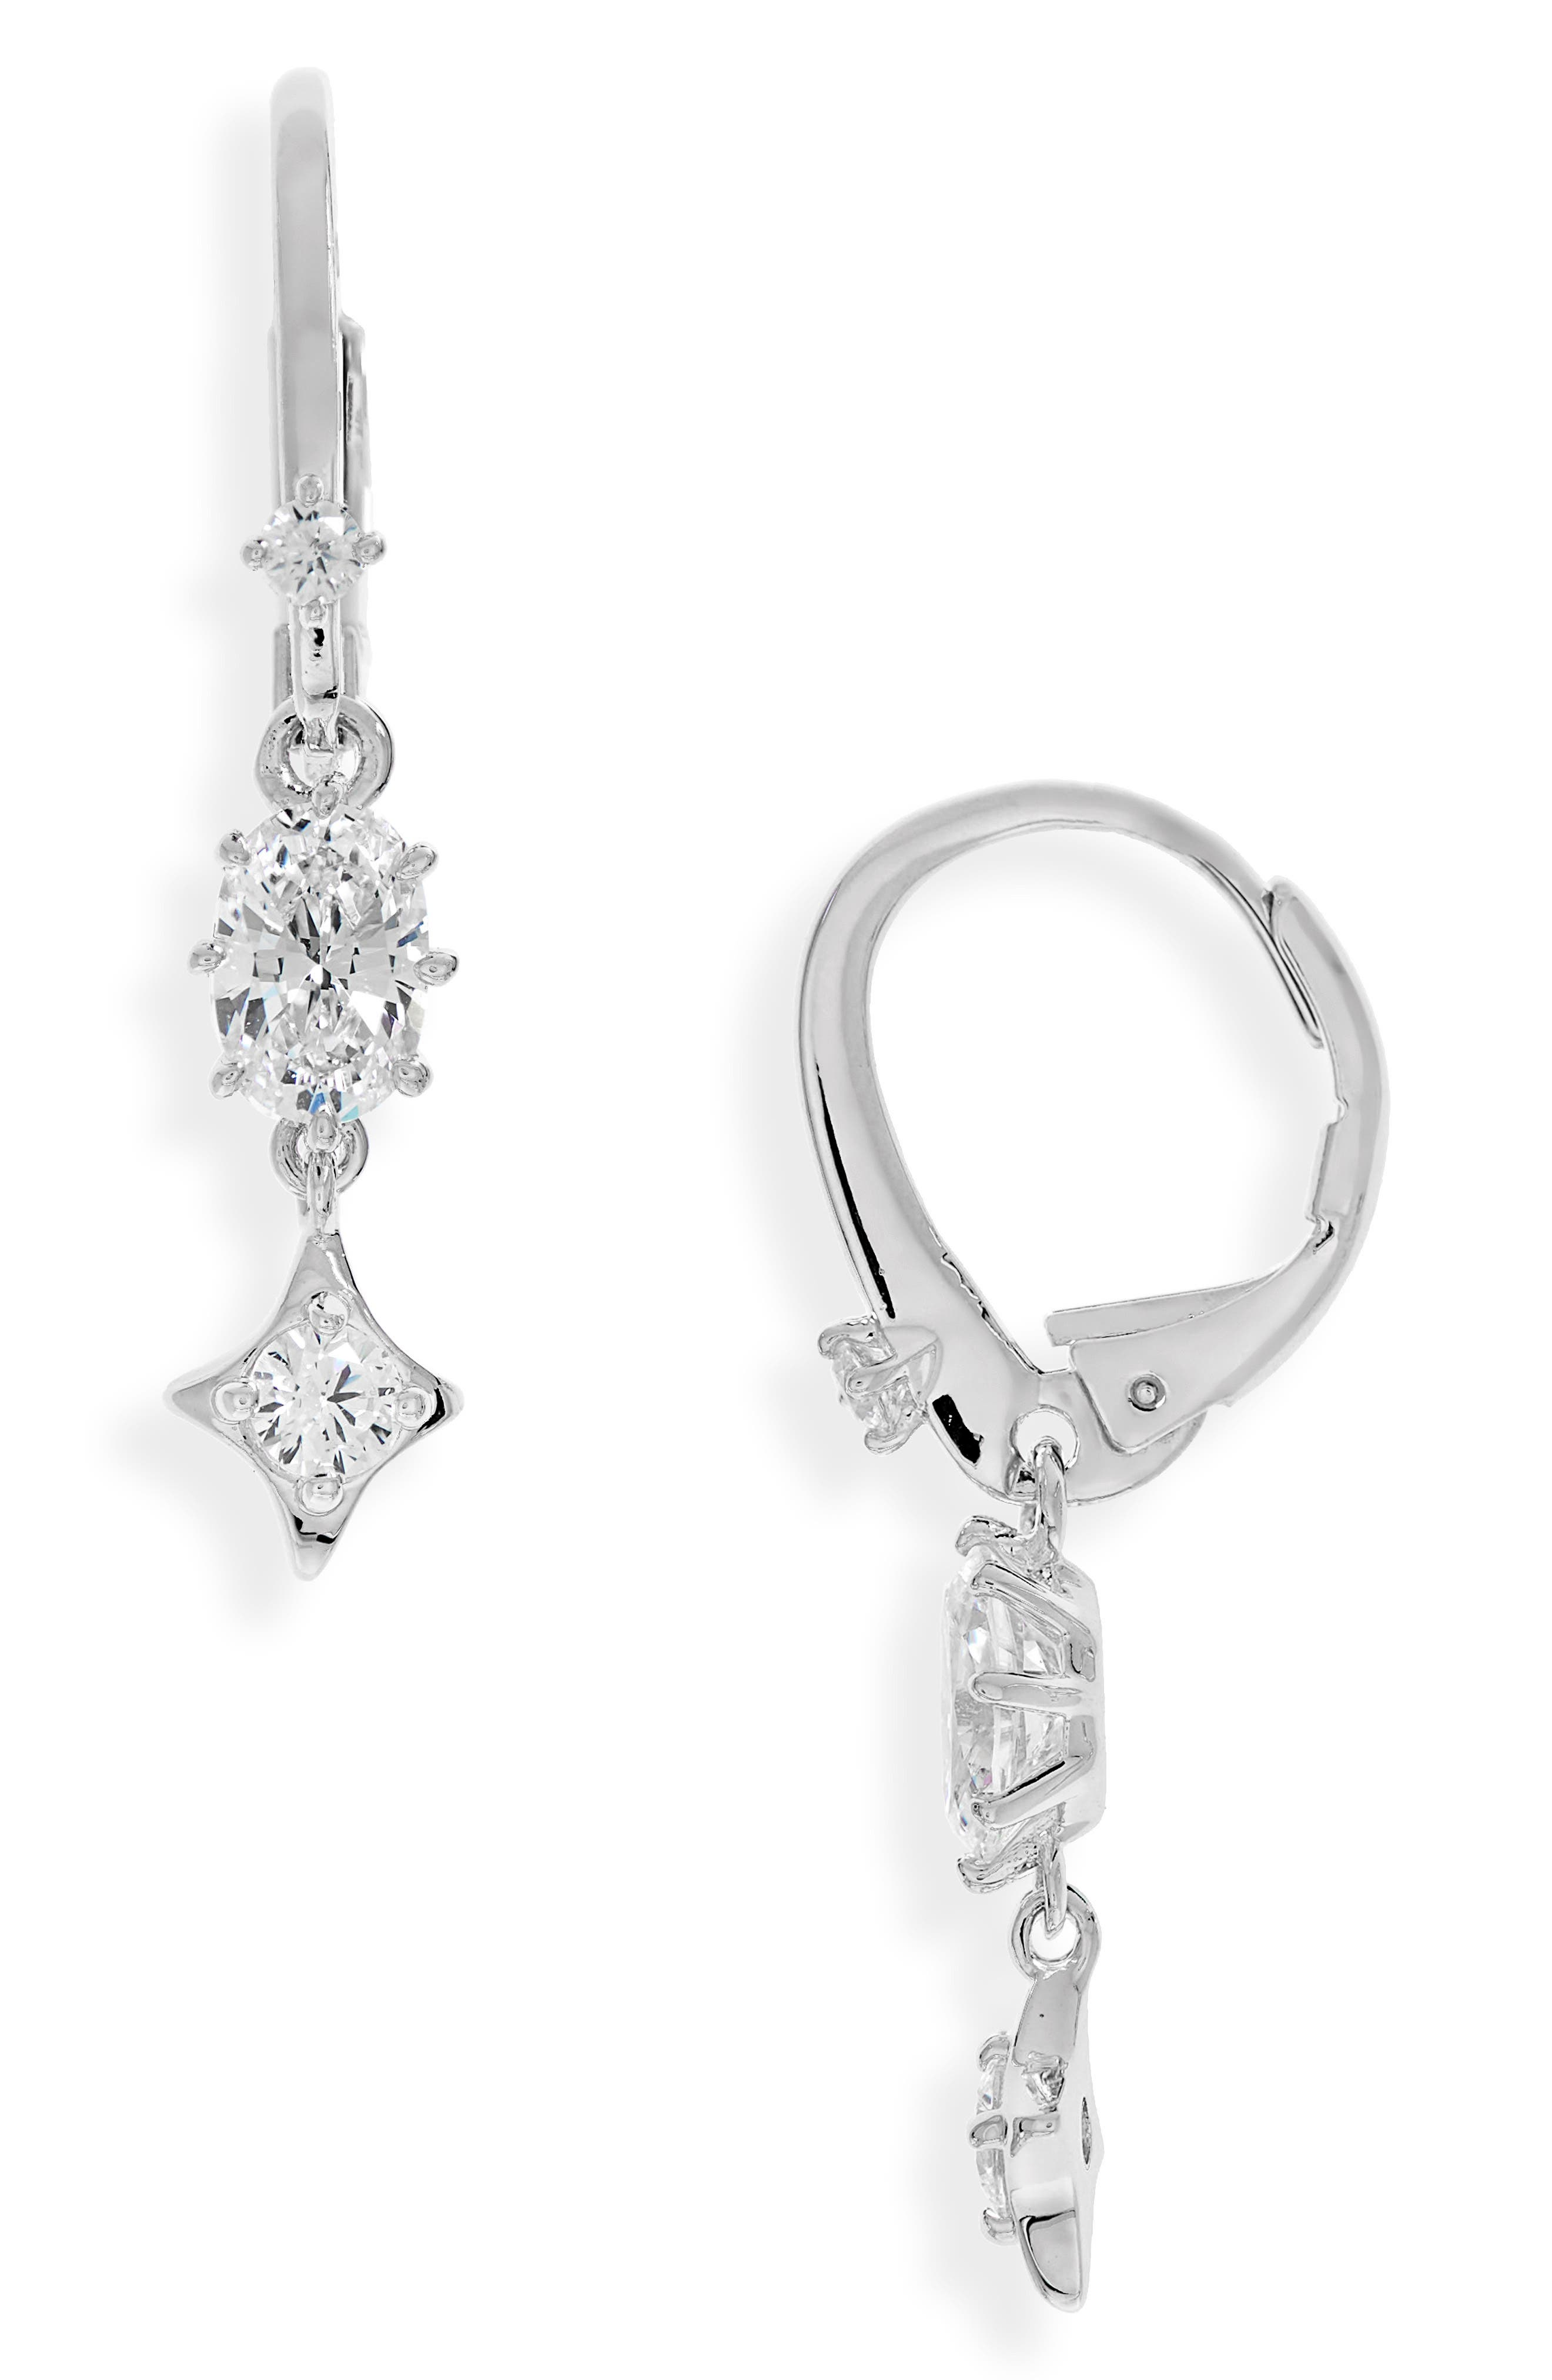 Boho Cubic Zirconia Drop Earrings,                         Main,                         color,